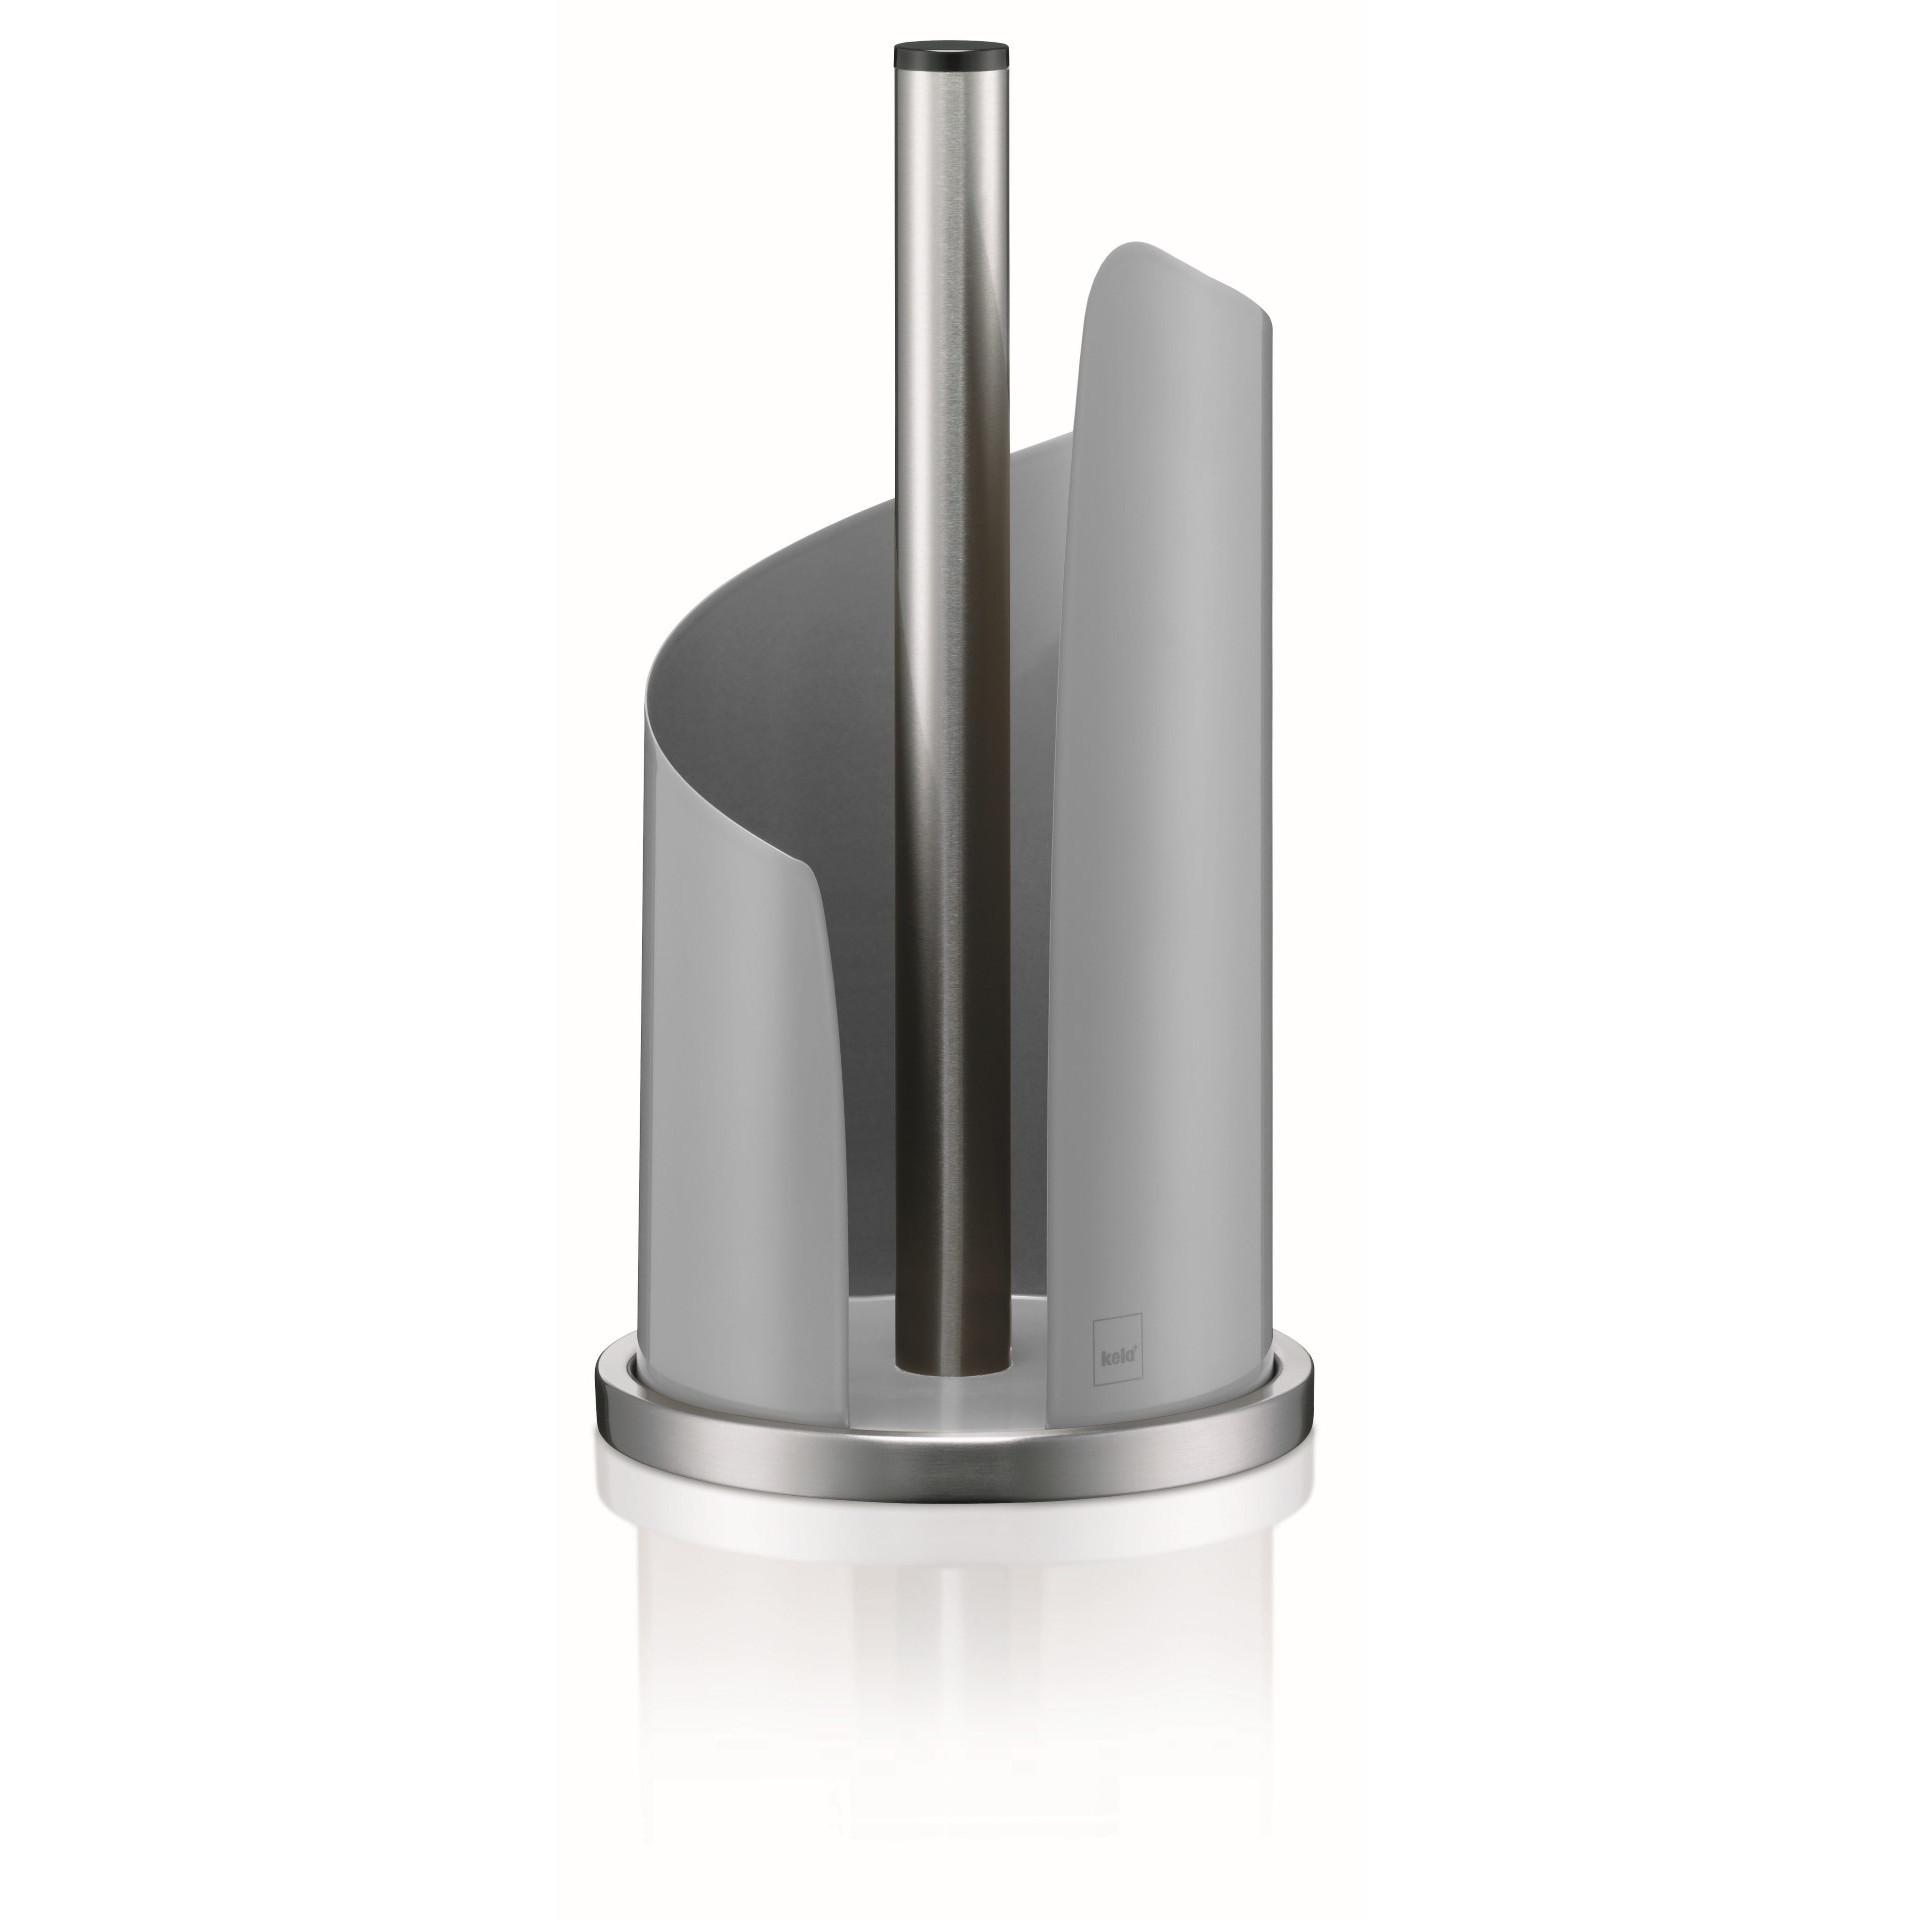 Küchenrollenhalter Ø 15 cm Stella | Grau